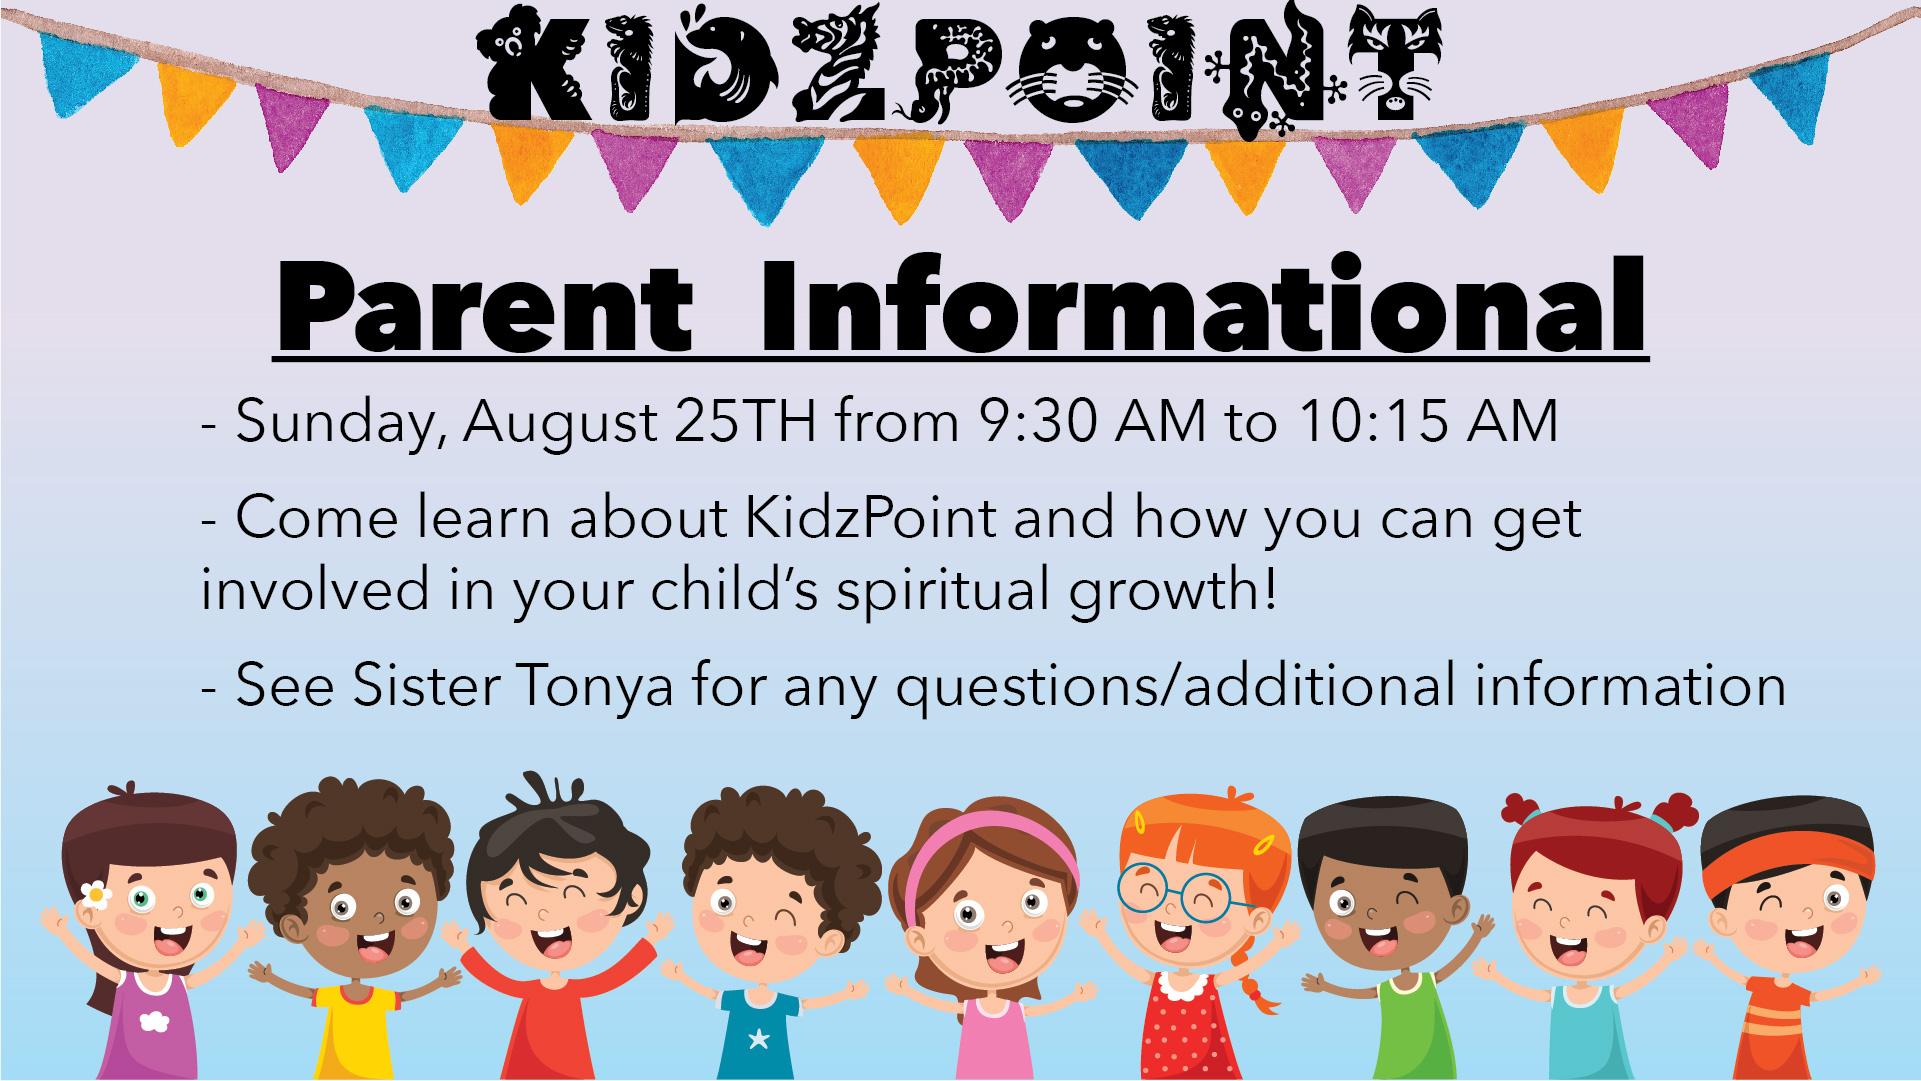 kp parent informational-01.jpg